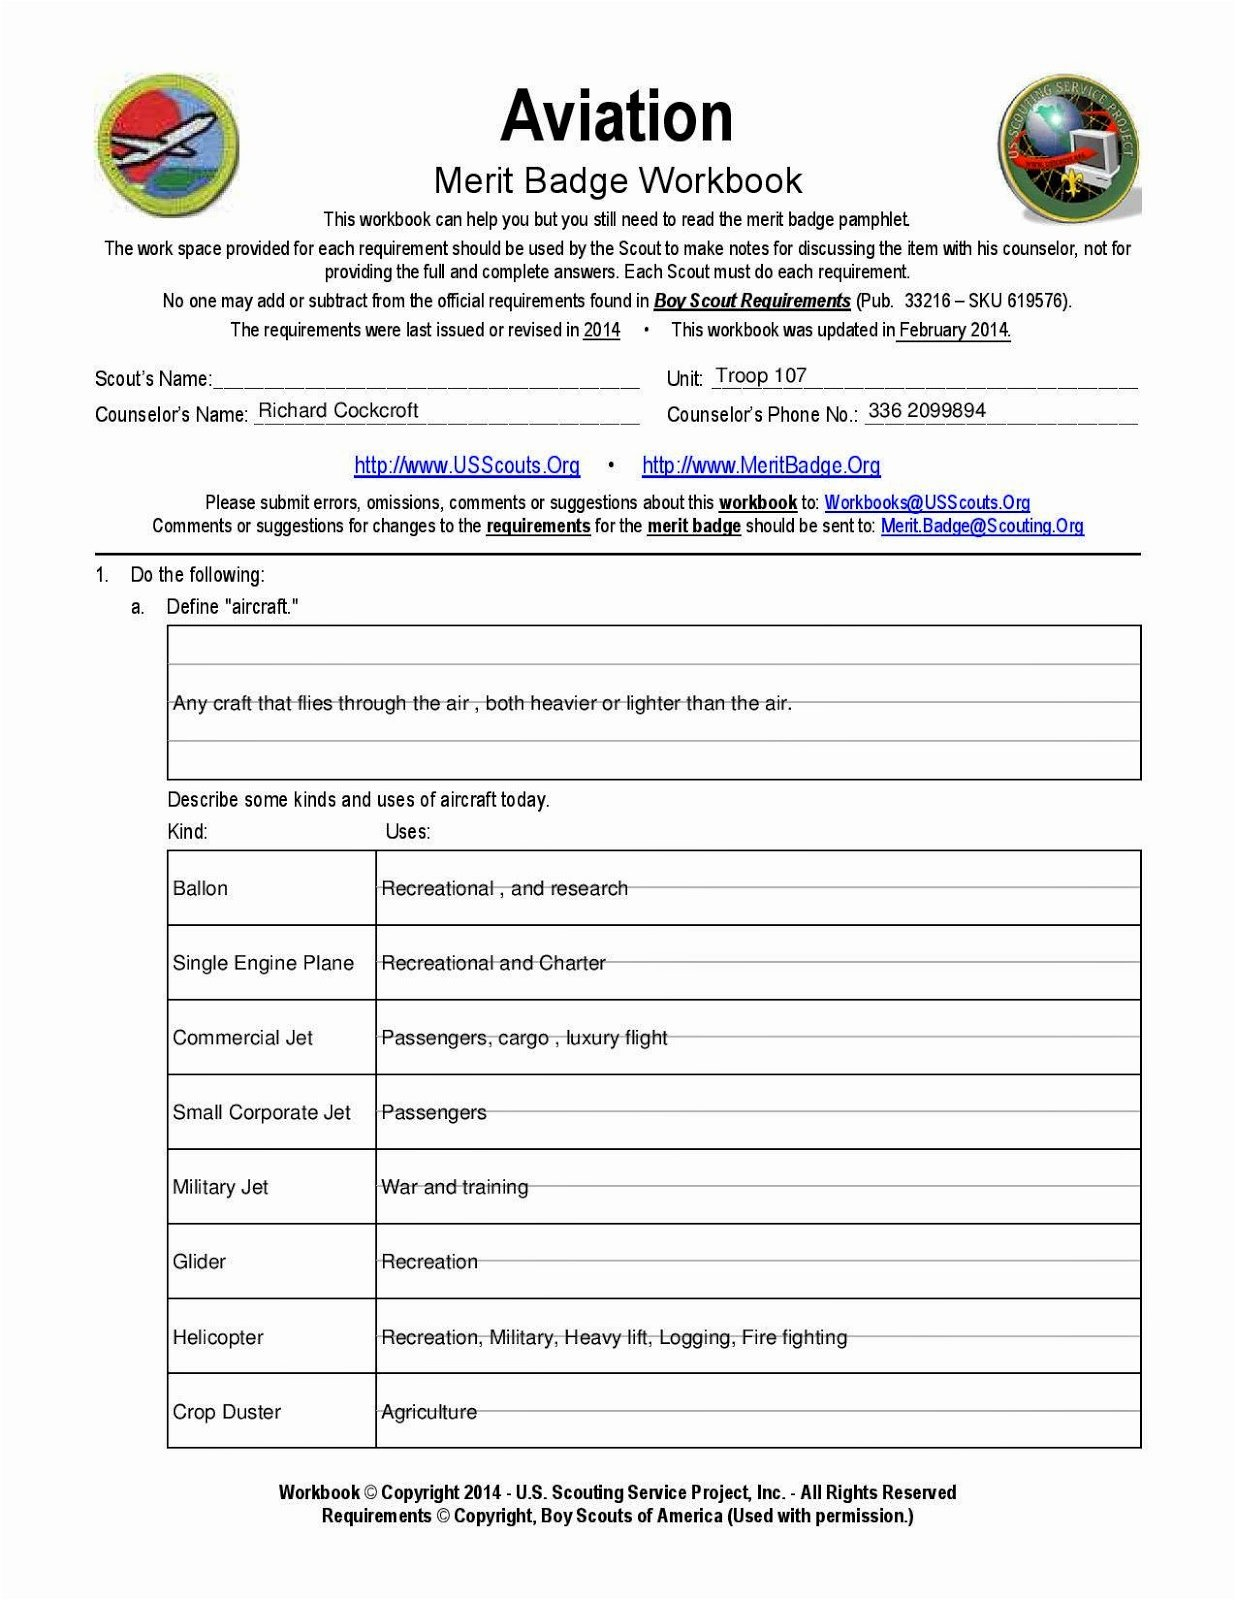 First Aid Merit Badge Worksheet Answers  Yooob Within Family Life Merit Badge Worksheet